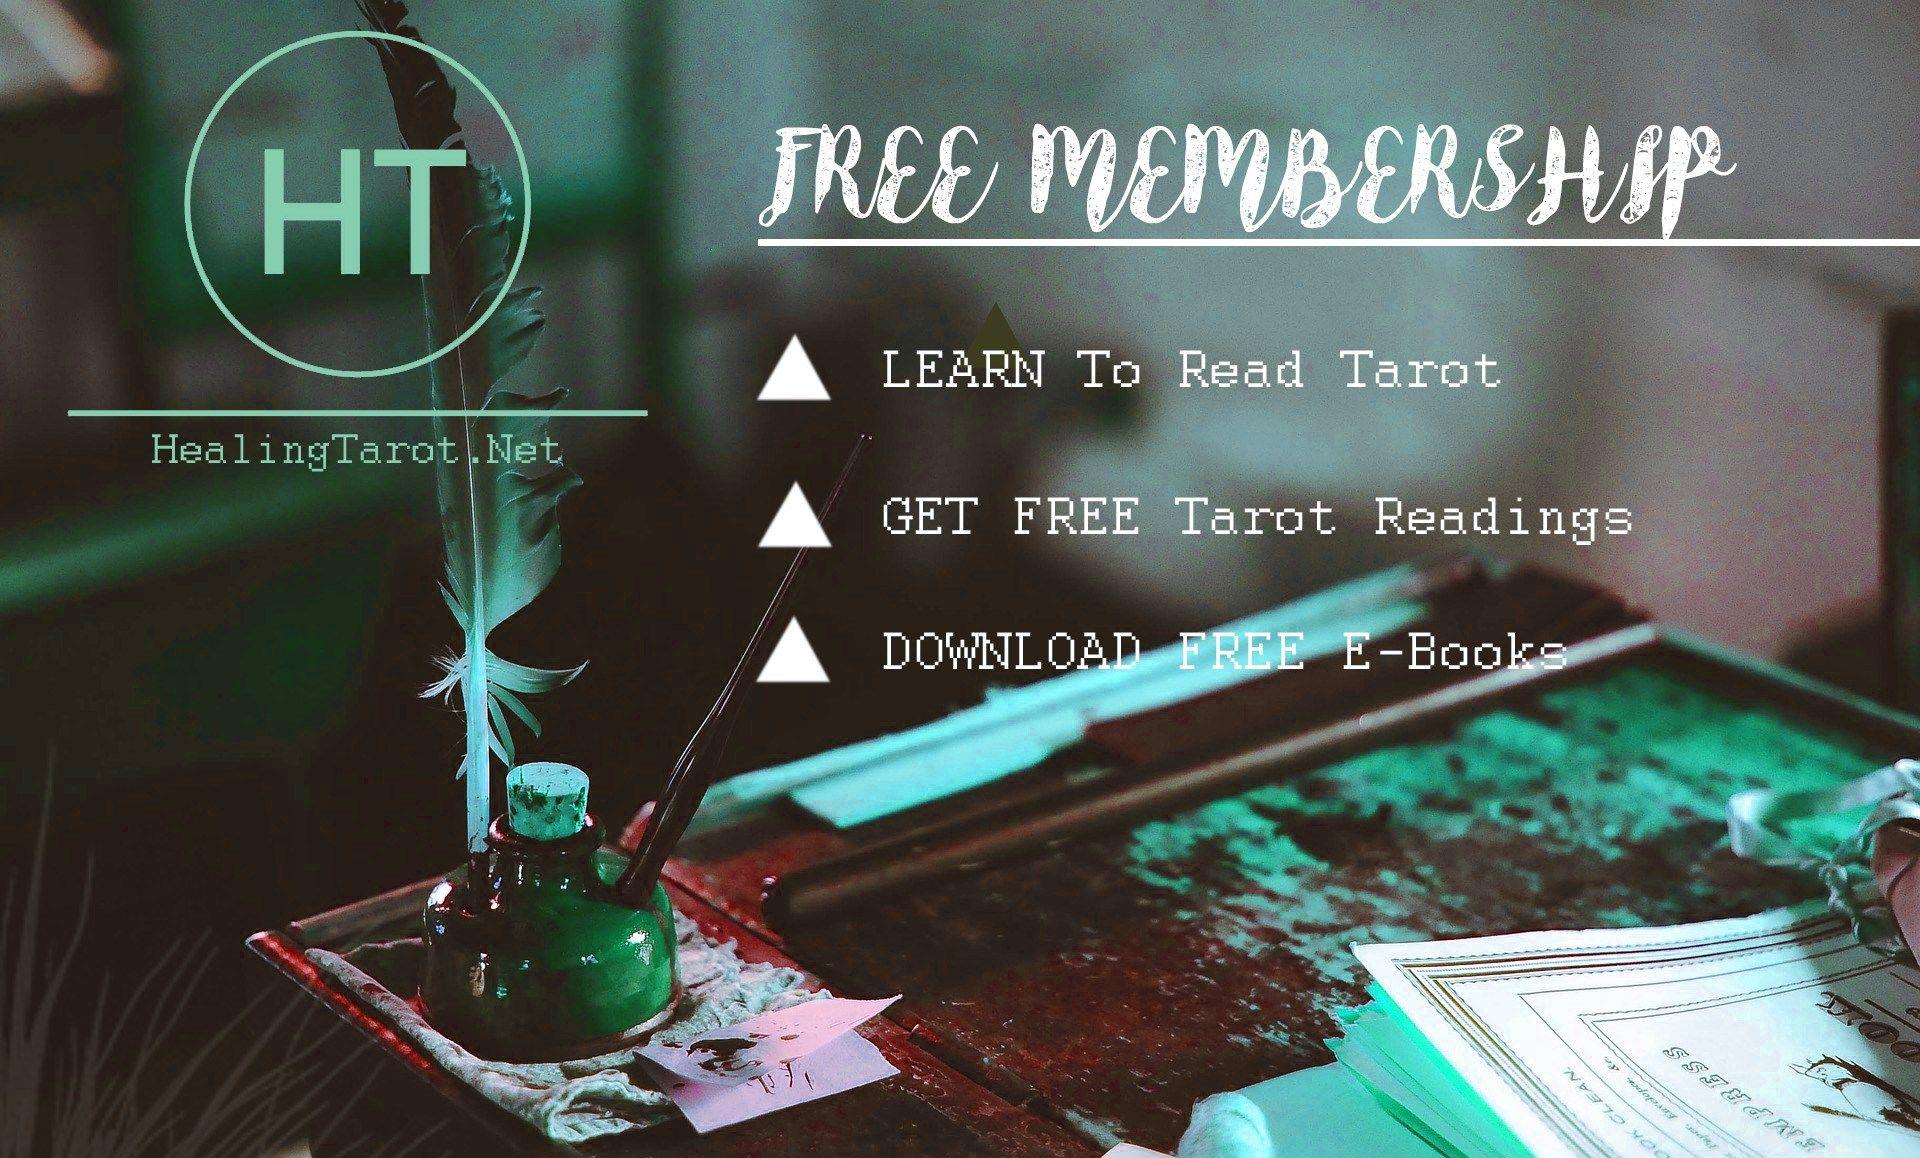 Free tarot email course free tarot tarot reading online